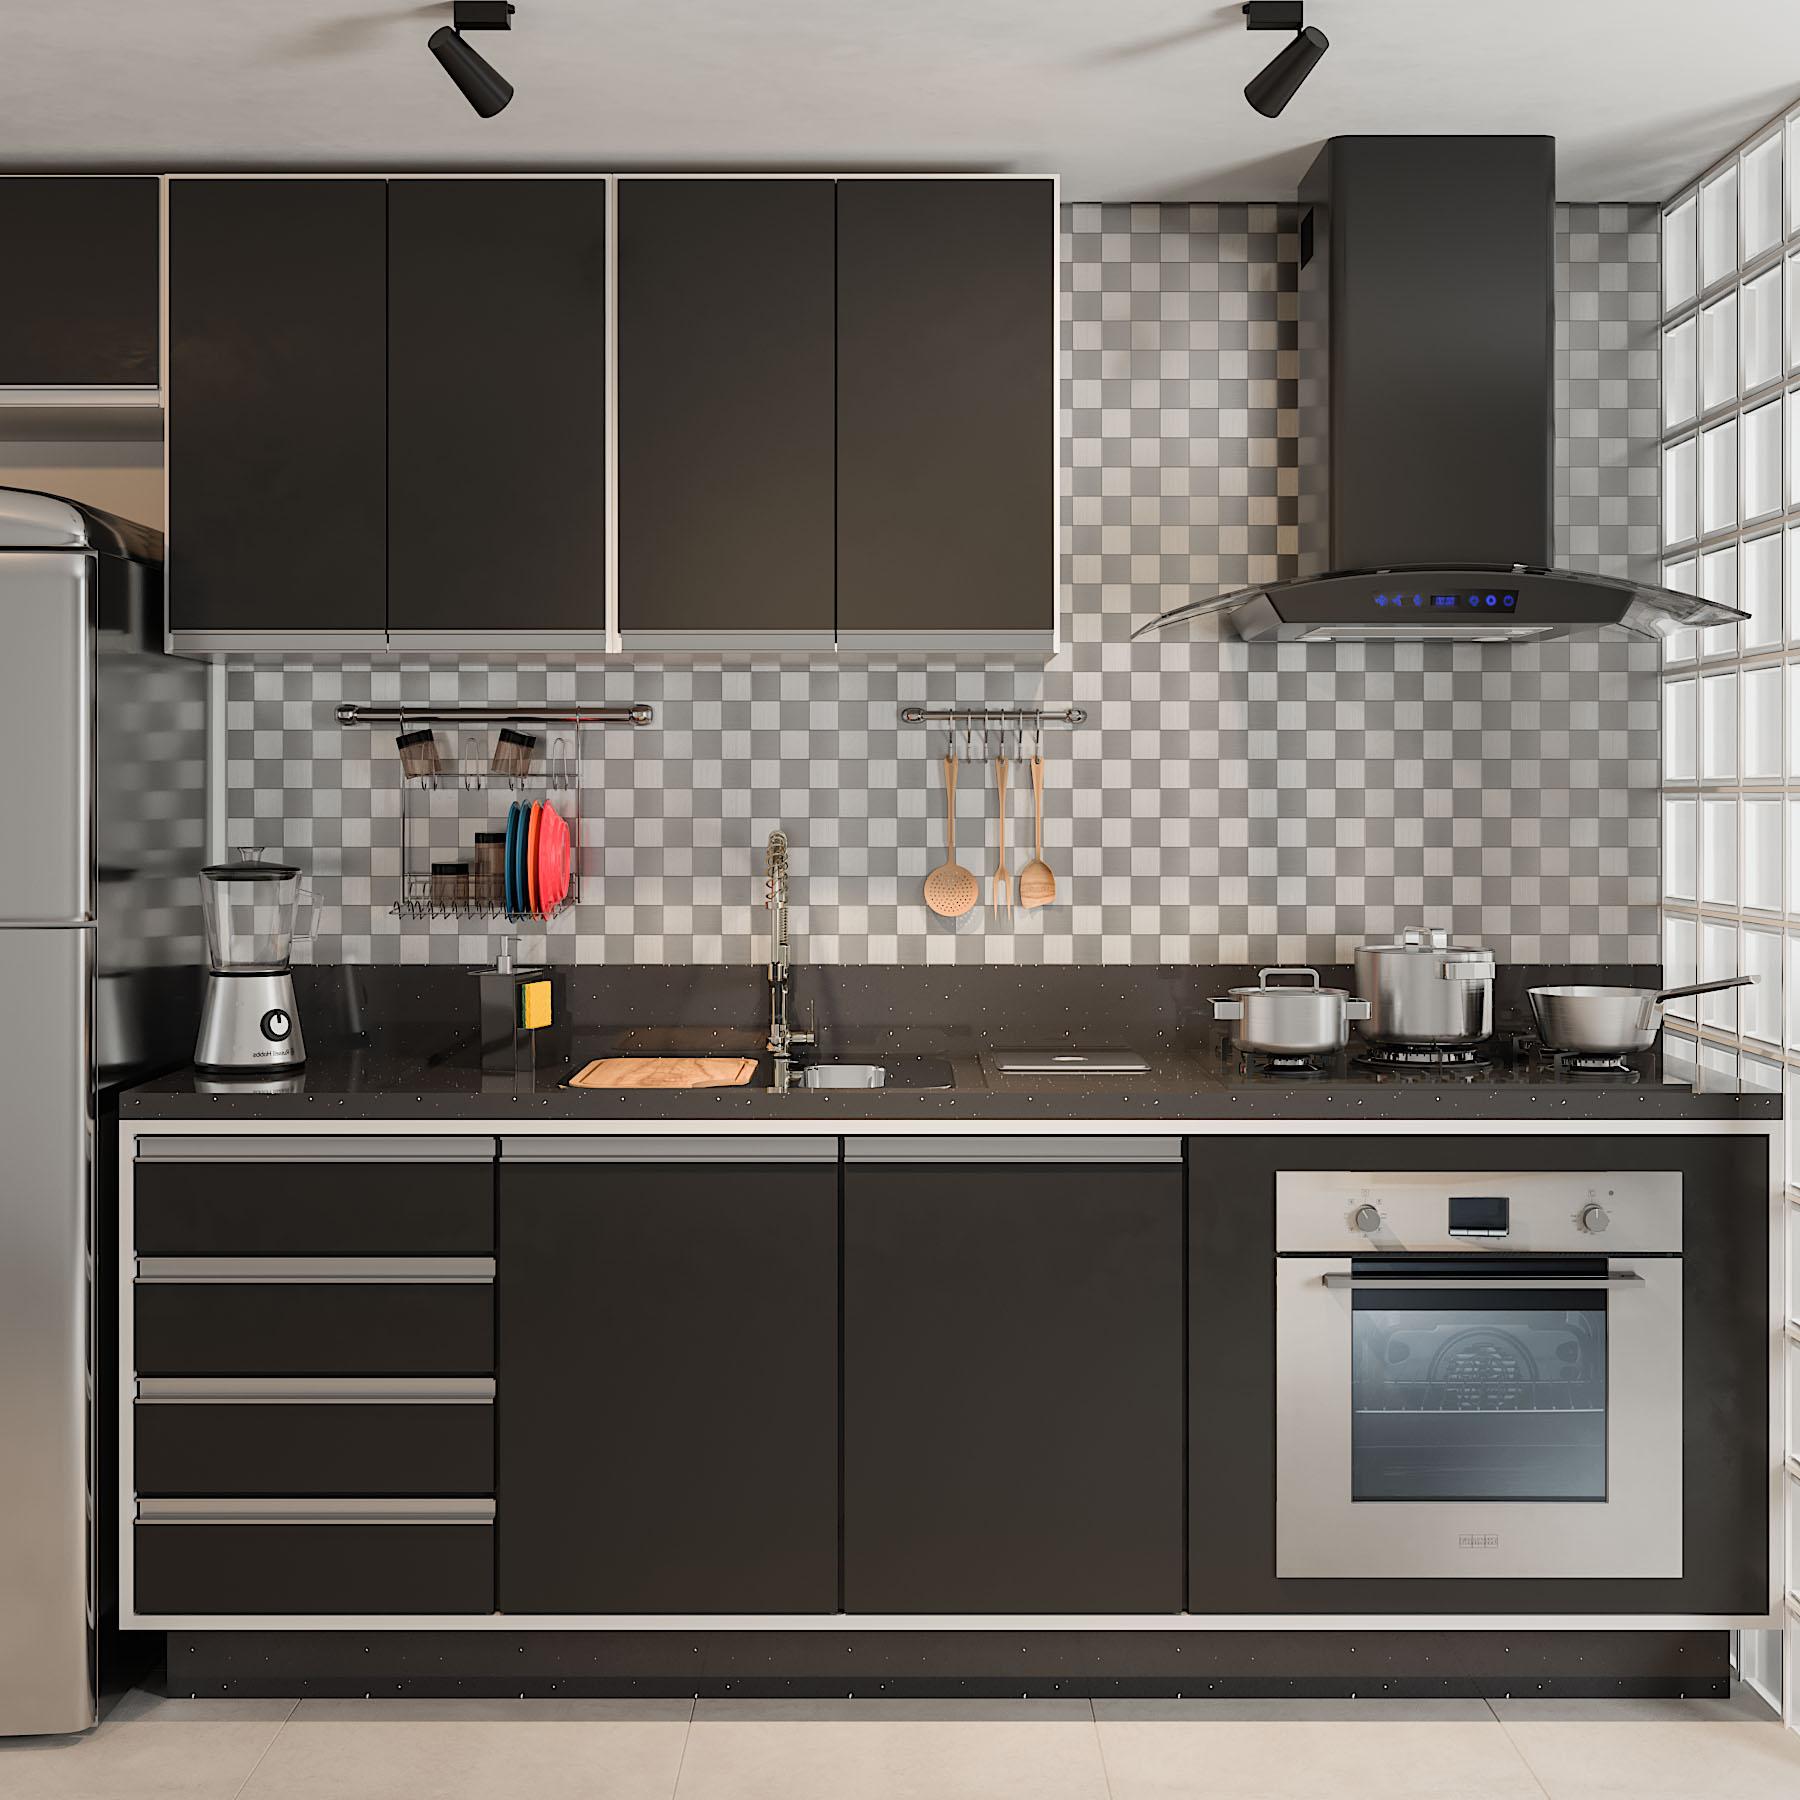 Image of: Cozinha Pequena Com Pastilha Adesiva Leroy Merlin